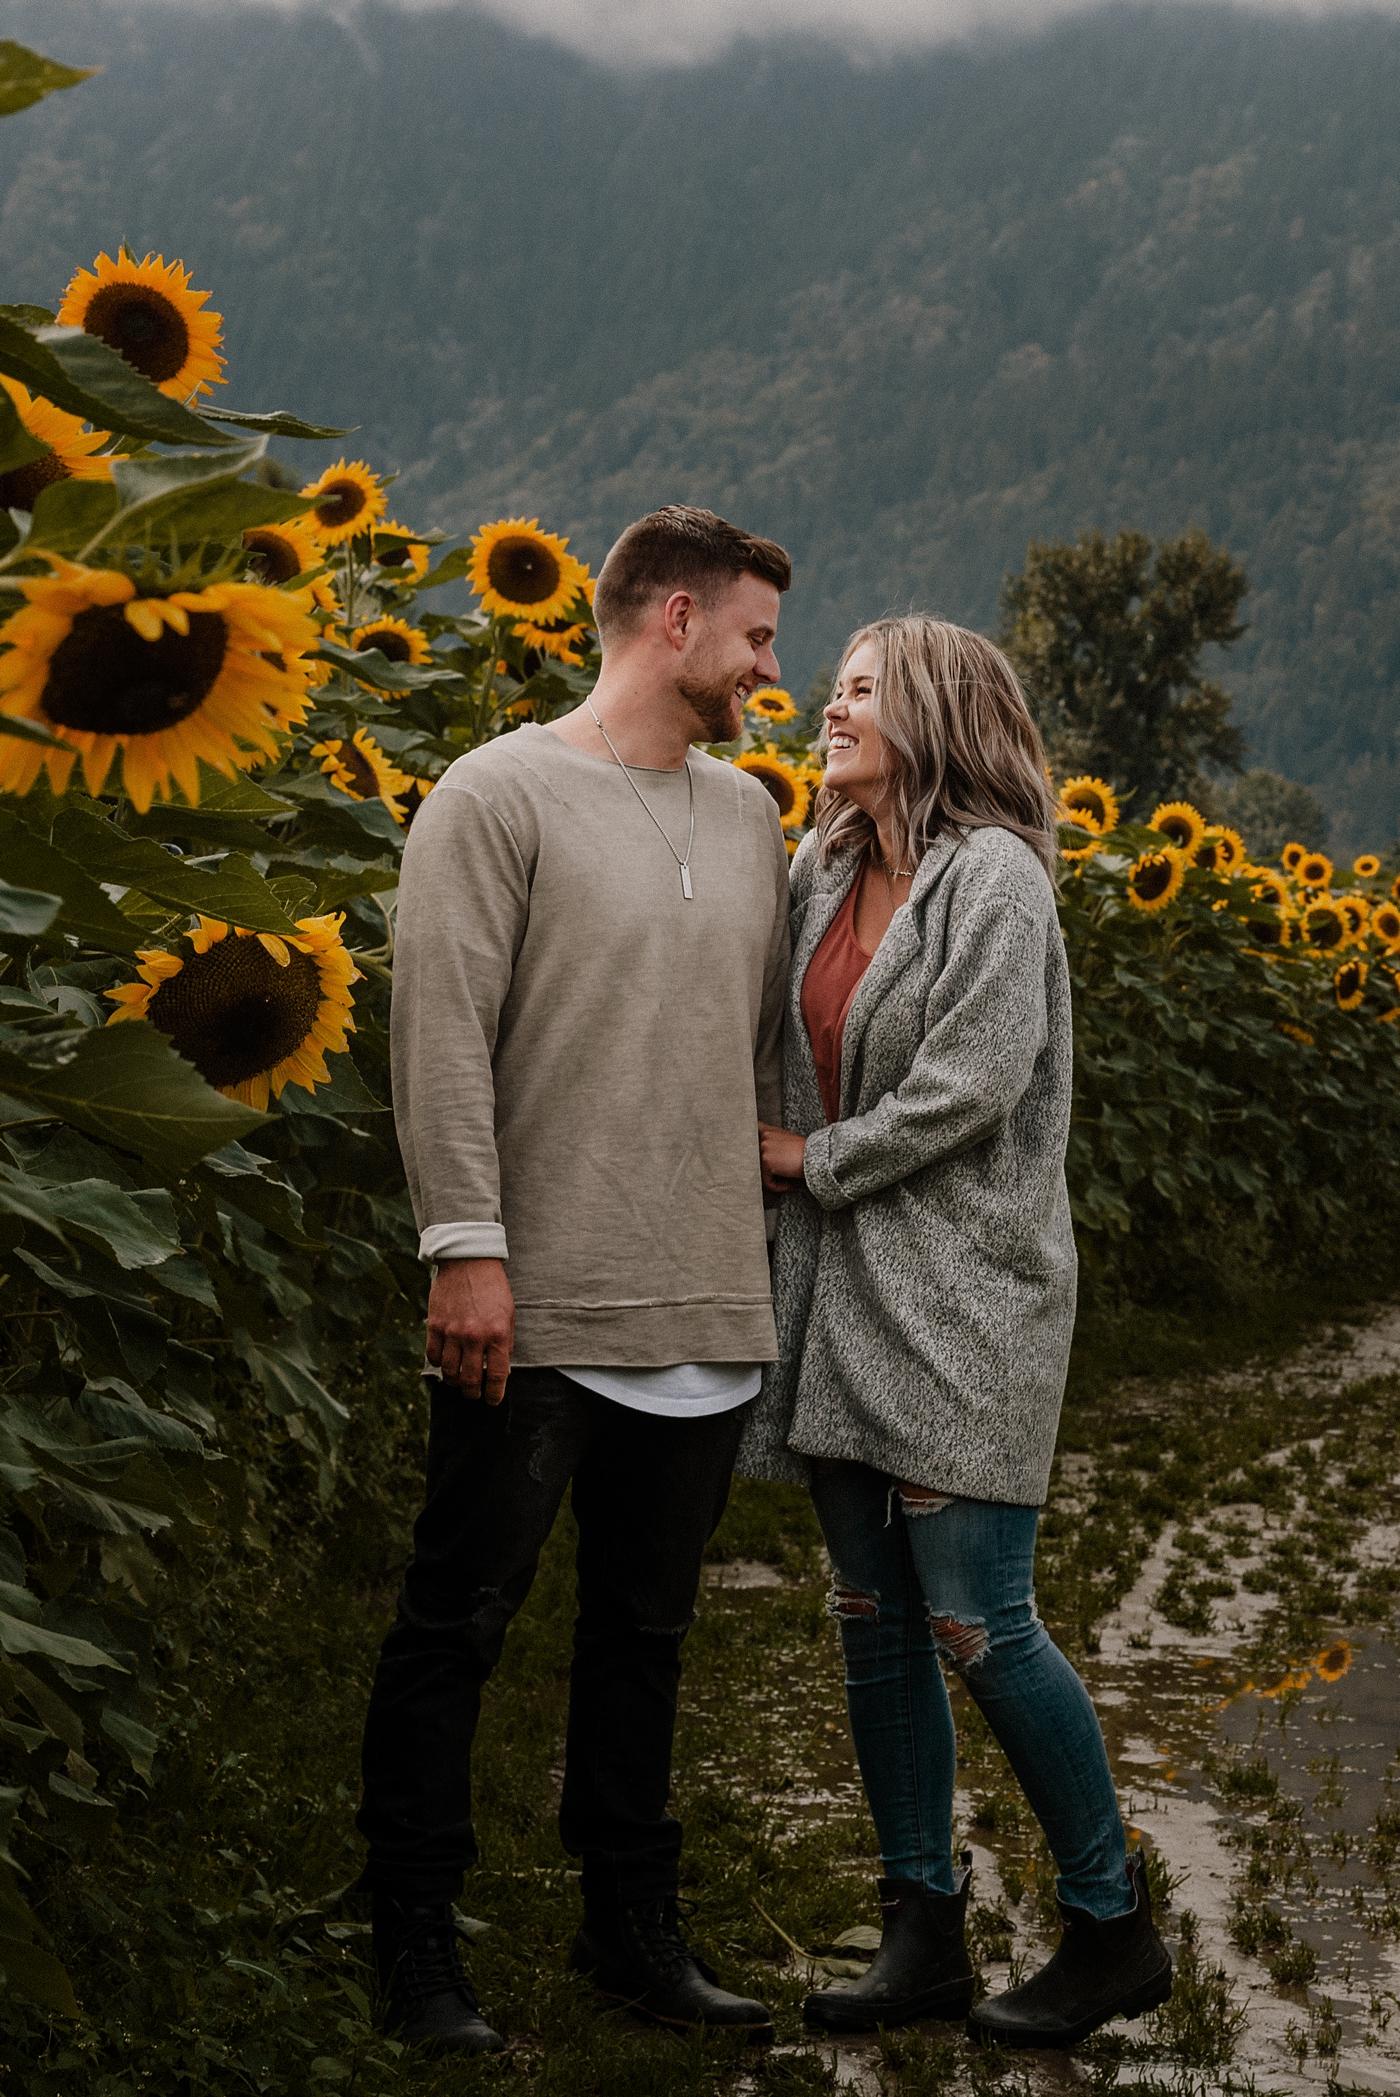 Beautiful-Sunflower-Couple-Photography_0001.jpg